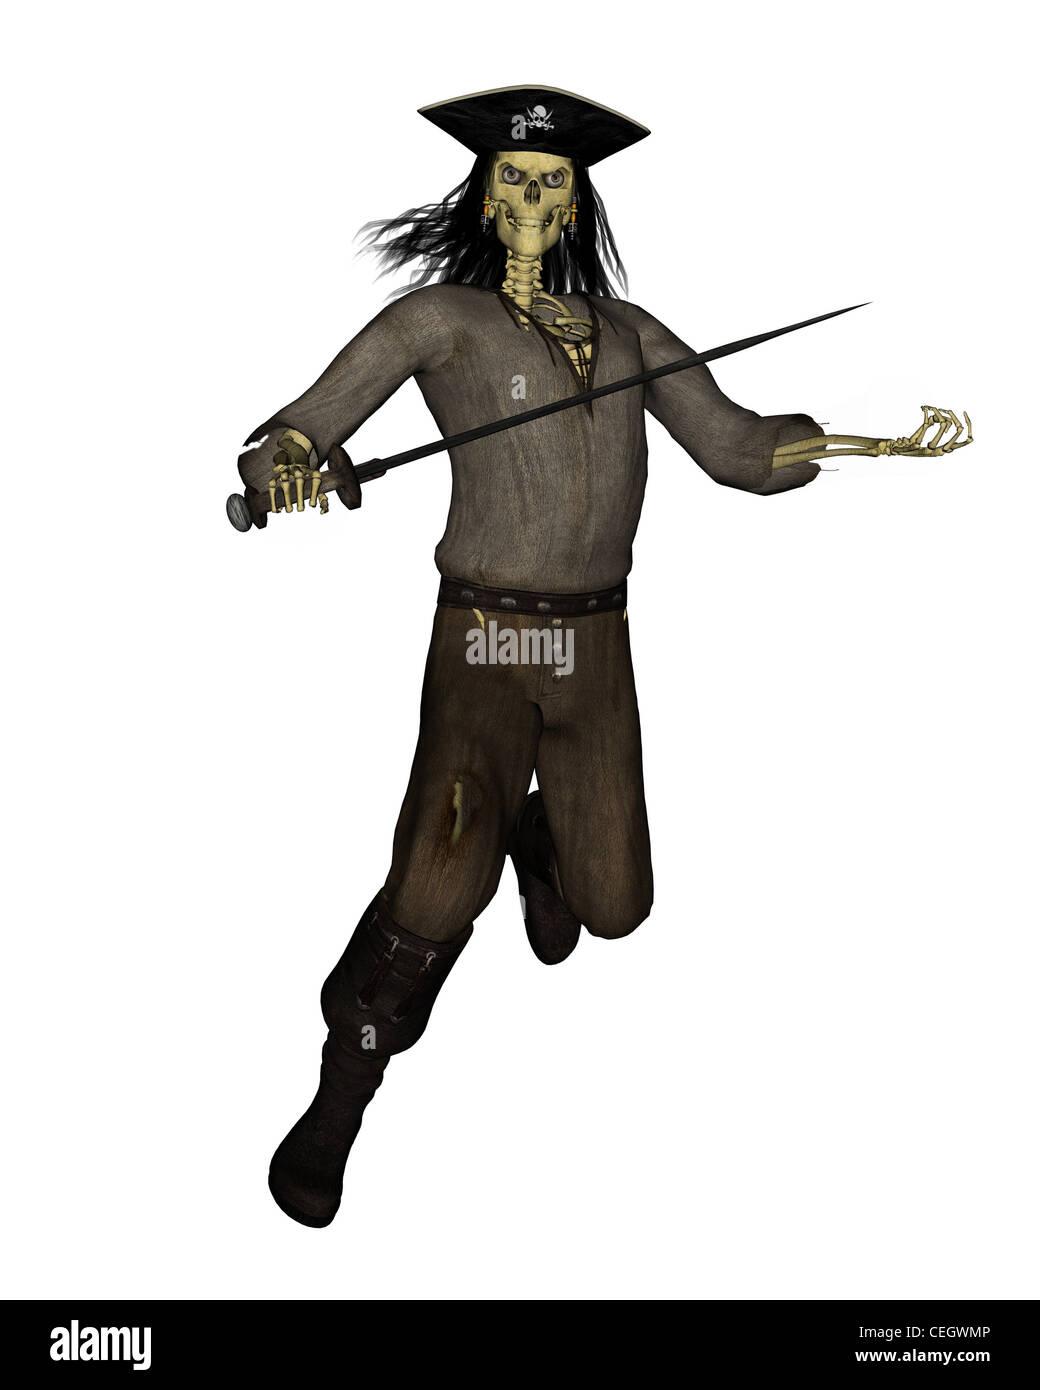 Undead Pirate Skeleton - 2 - Stock Image